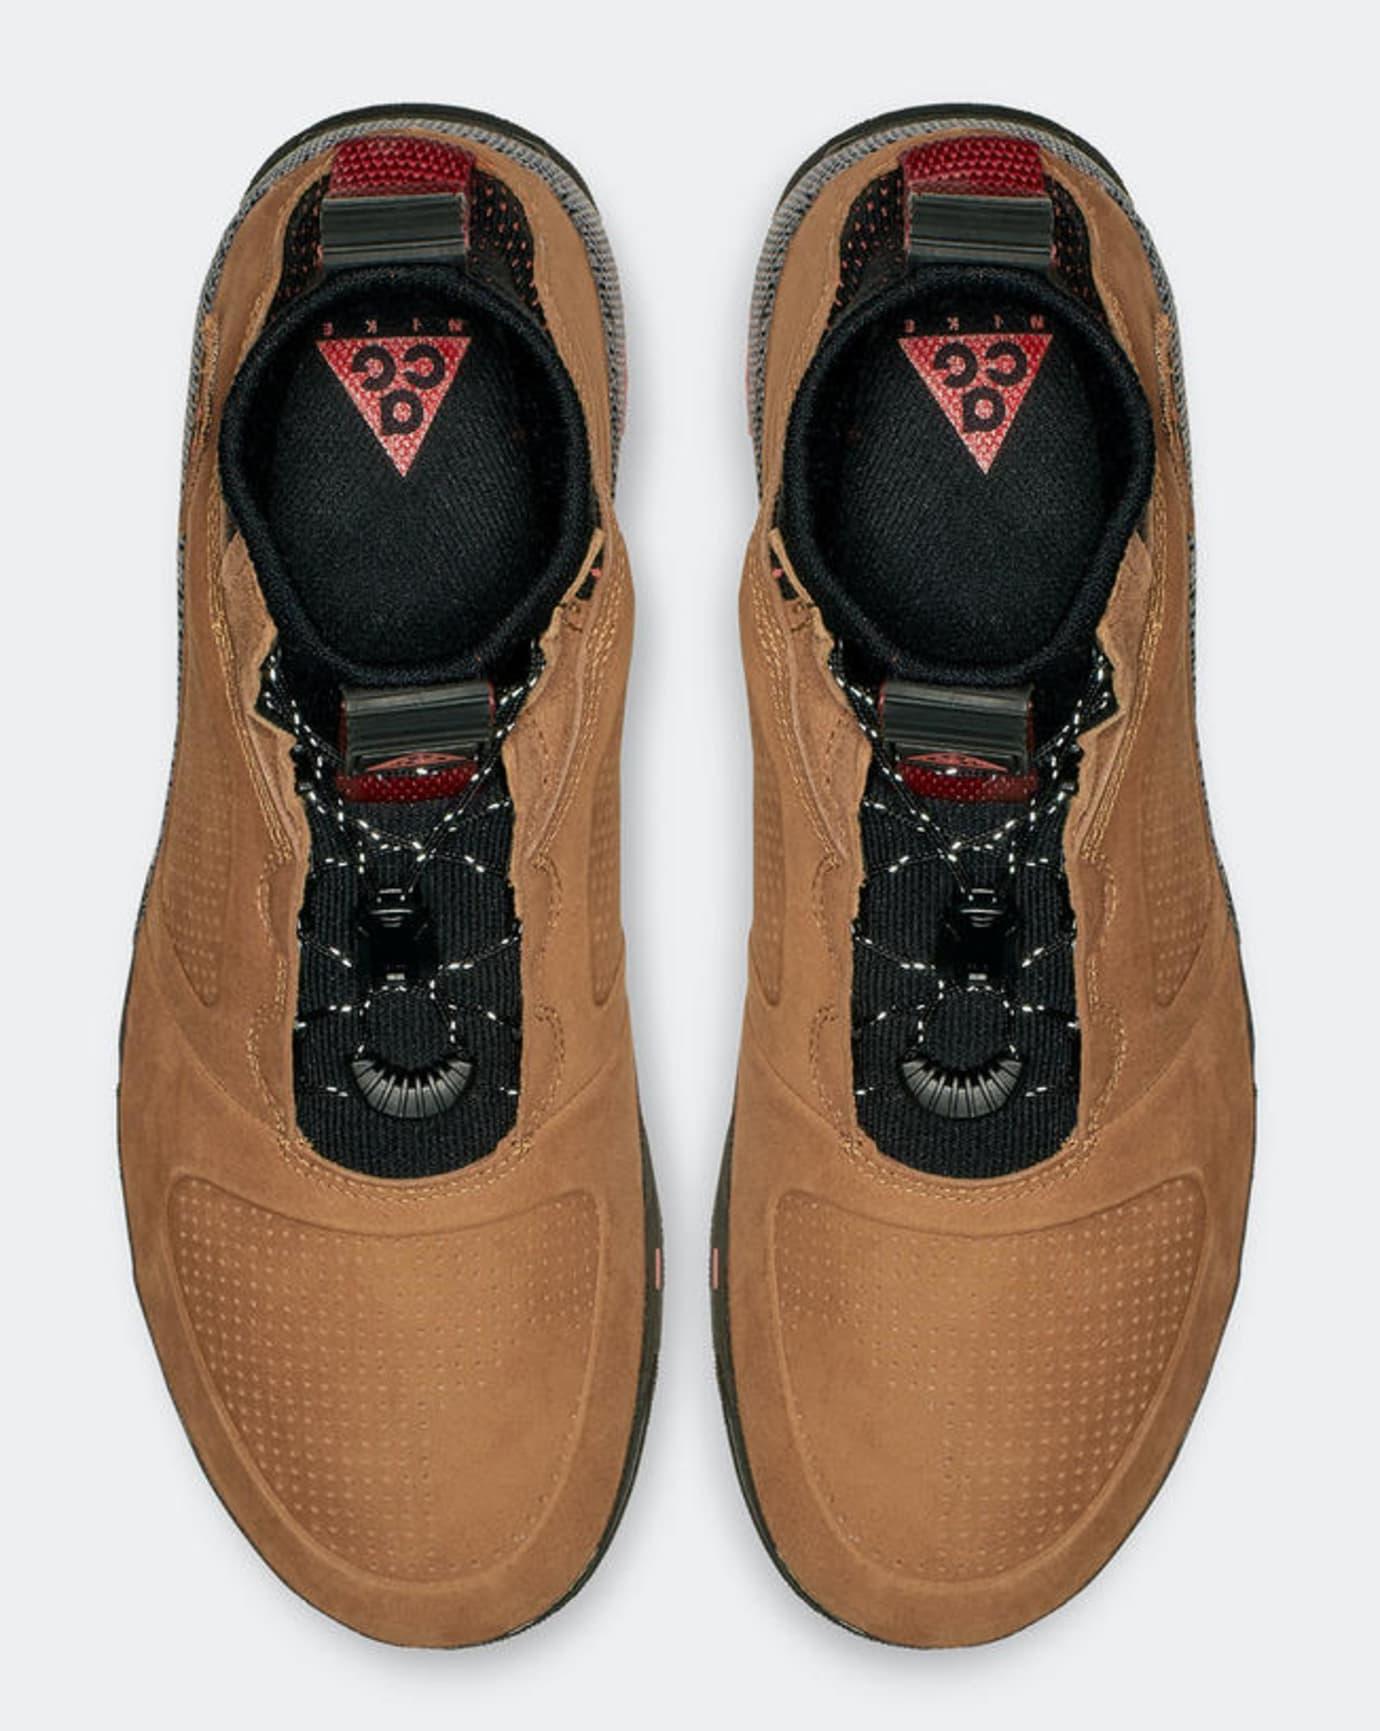 Nike ACG Ruckel Ridge 'Brown' (Top)